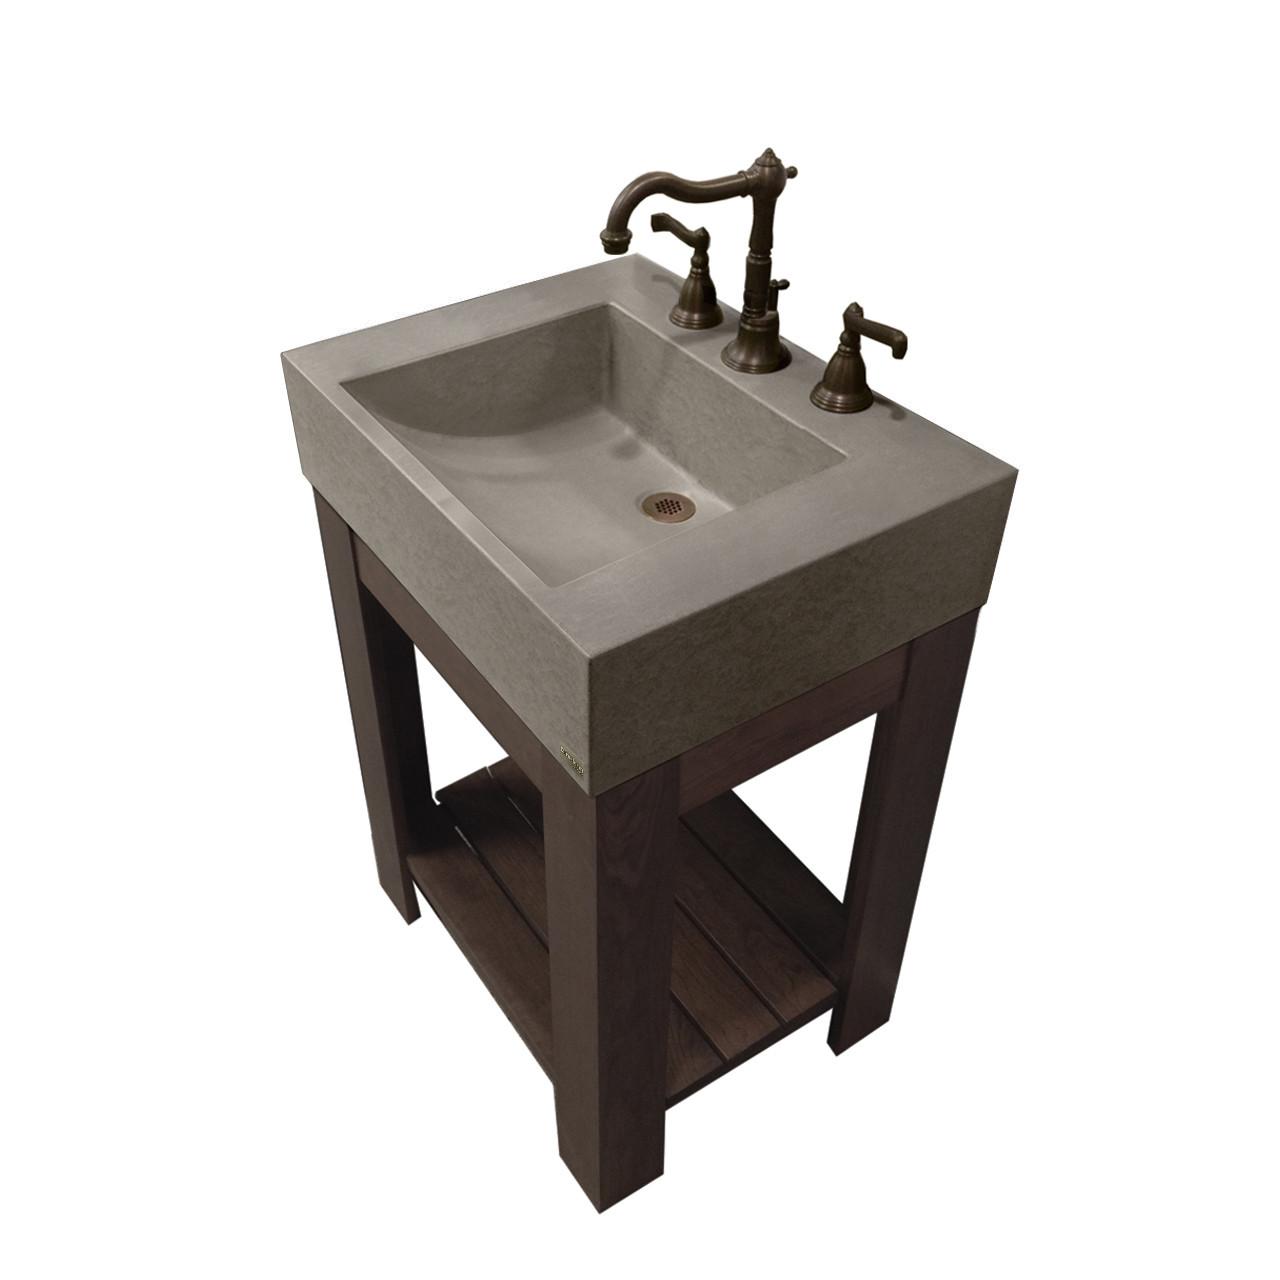 24 Lavare Vanity With Concrete Half Trough Sink